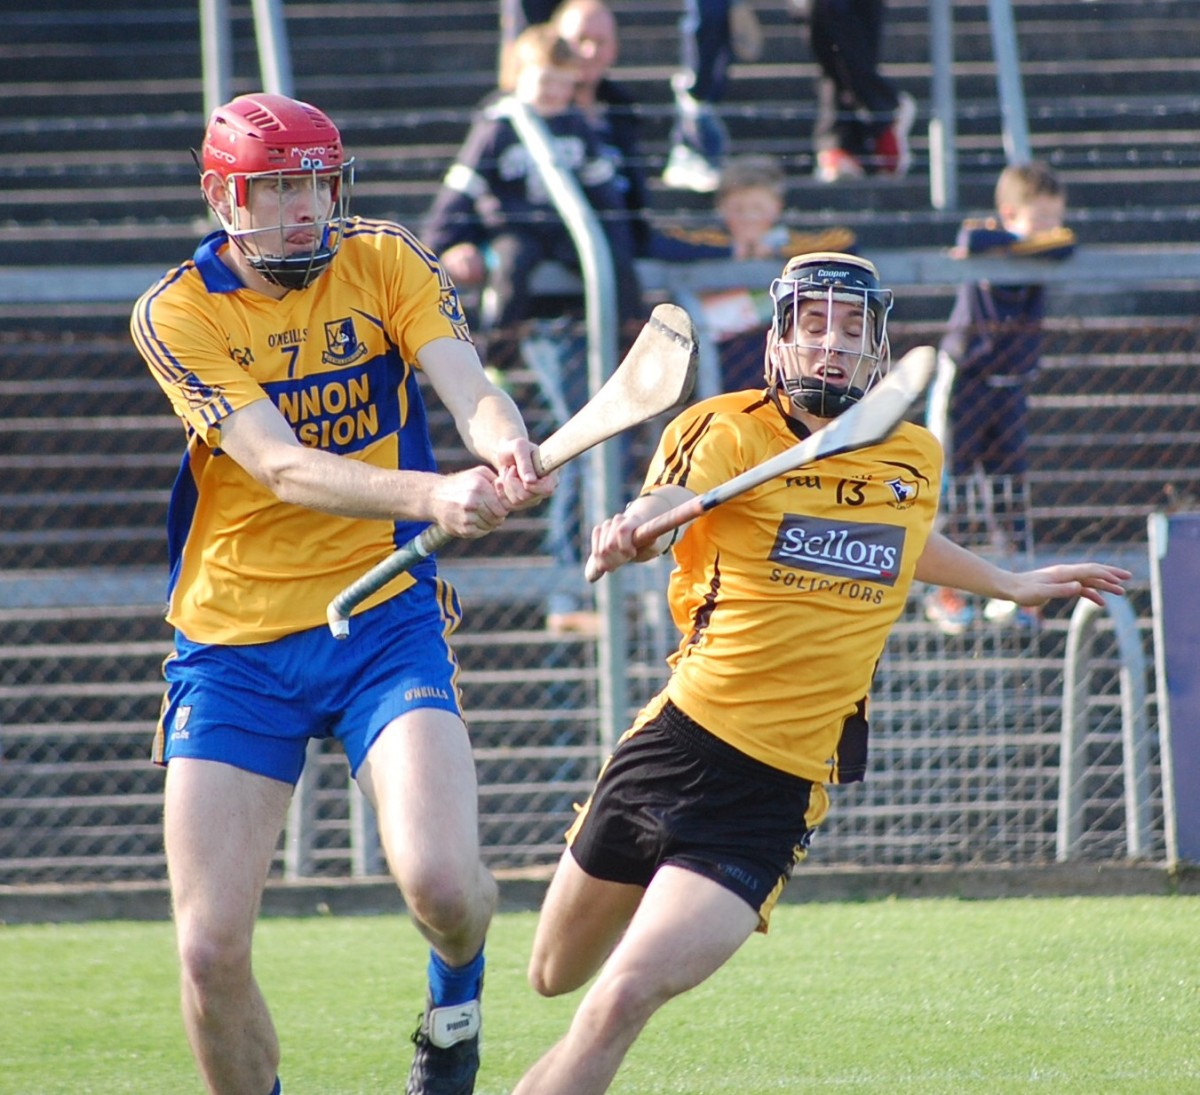 Paidi Fitzpatrick strikes under pressure from Mícheál O'Loughlin. Picture: Veronica McMahon